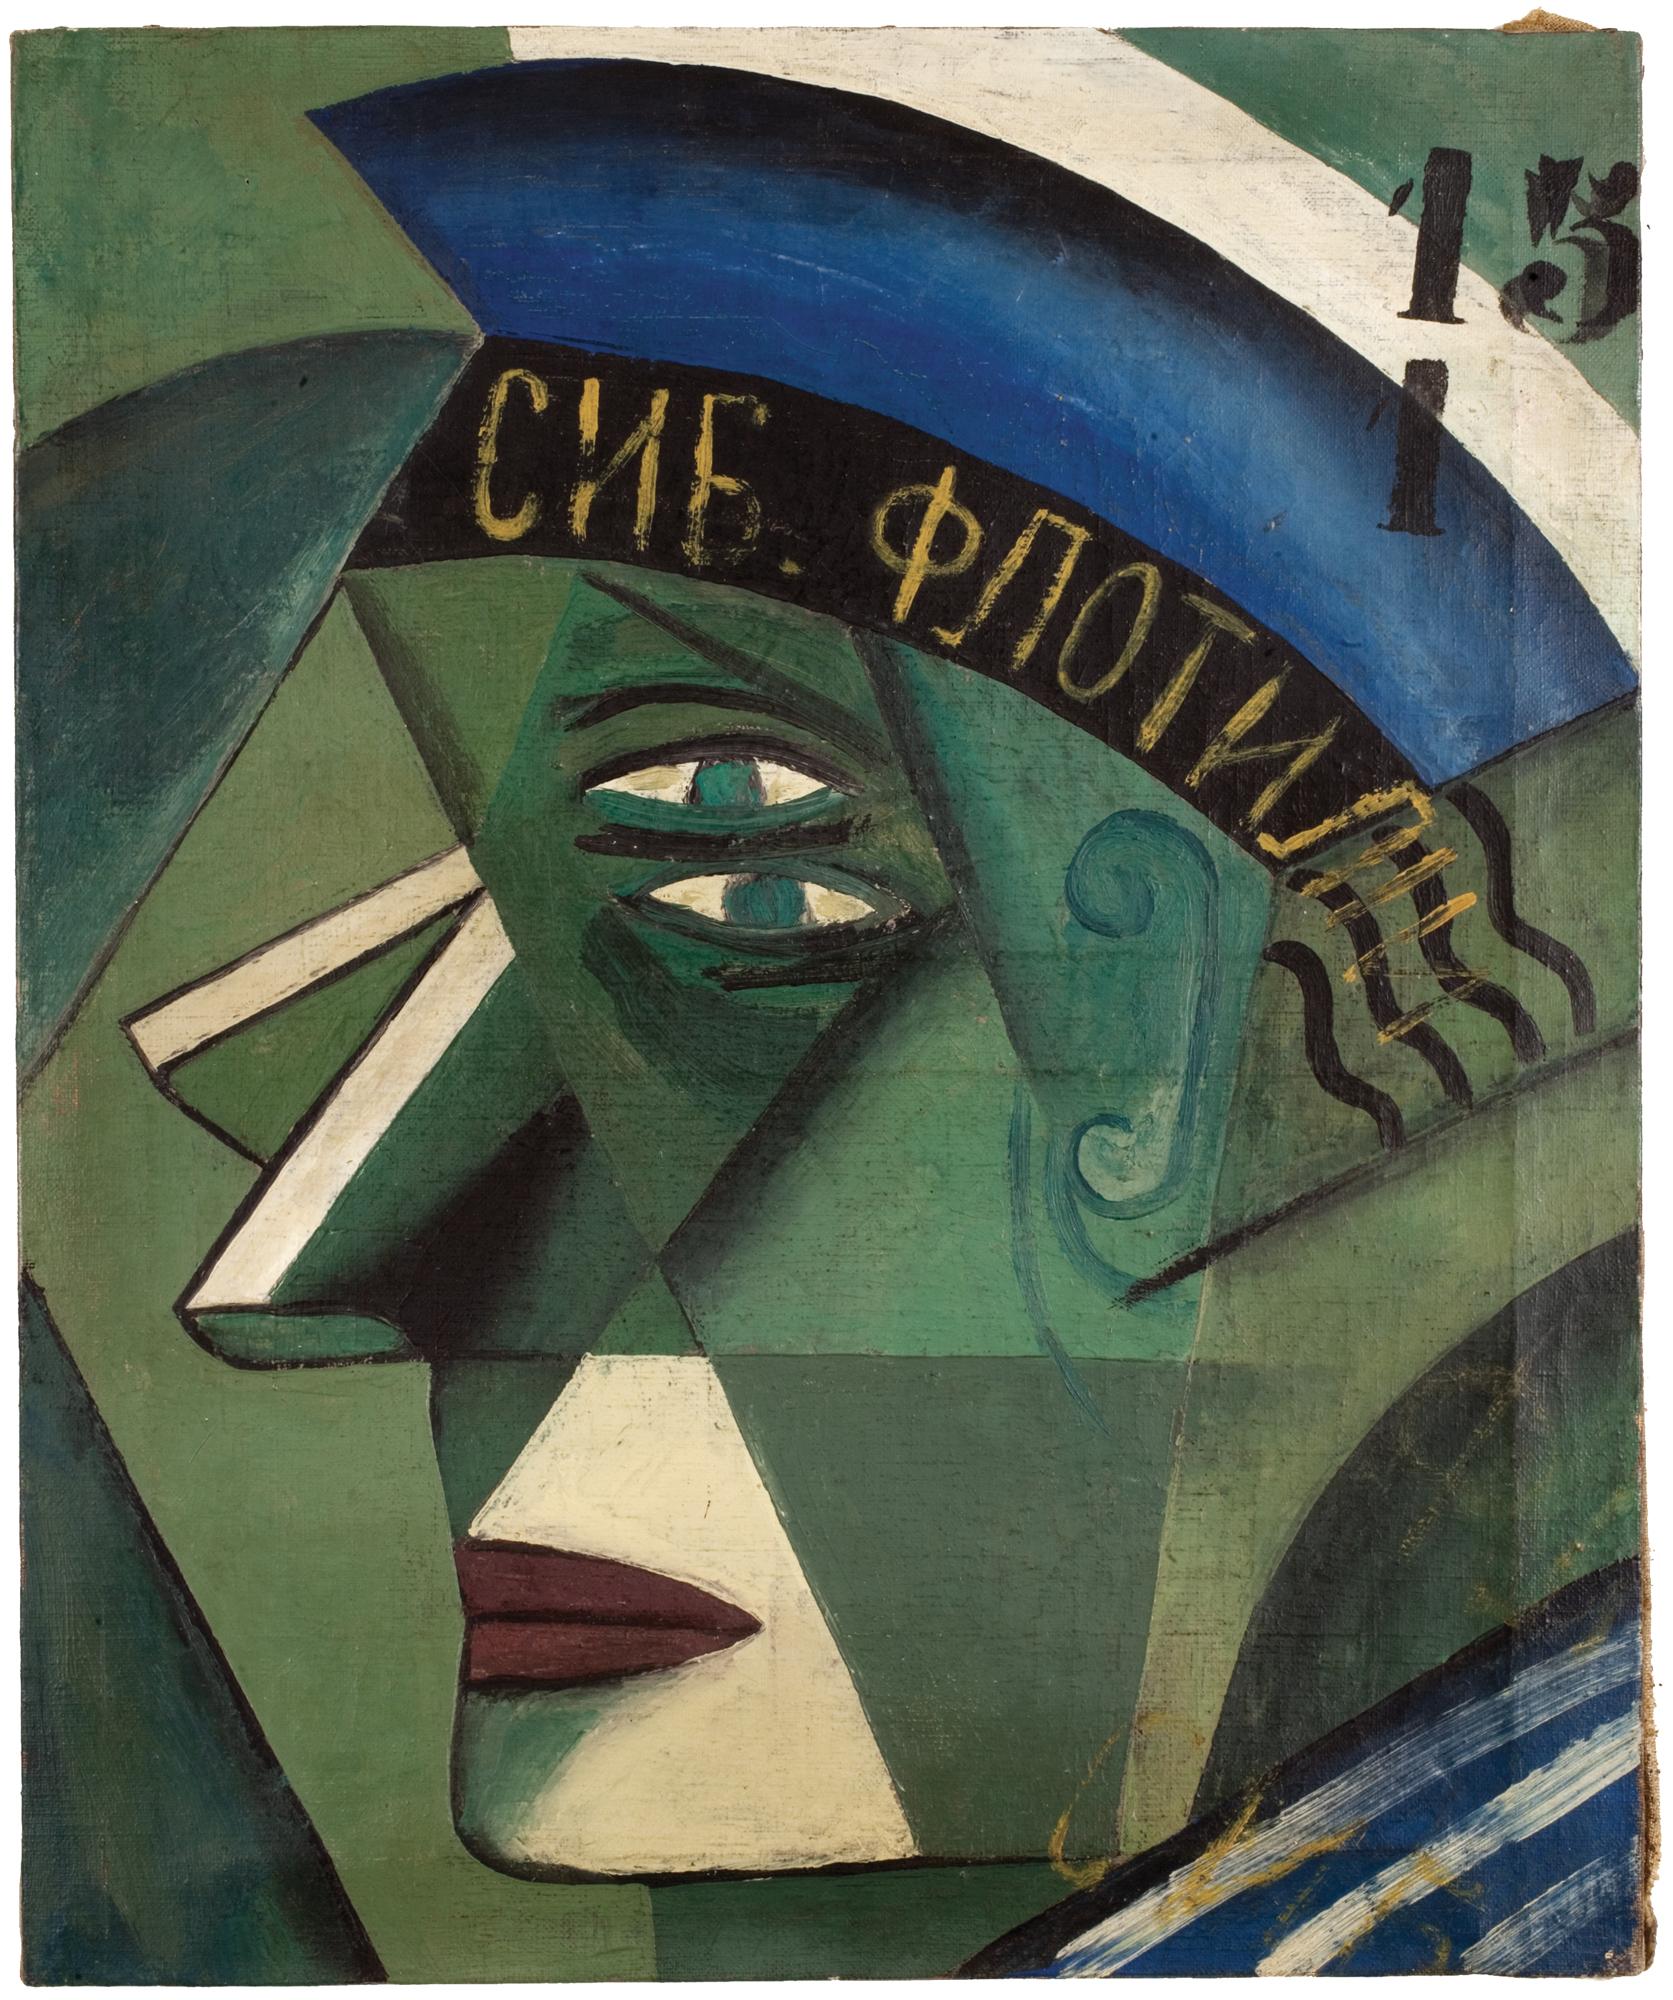 "Unattributed. Unsigned.Inscription on sailor's cap translates as ""SIB. FLOTILLA.""Oil on canvas. 46 x 38 cm."